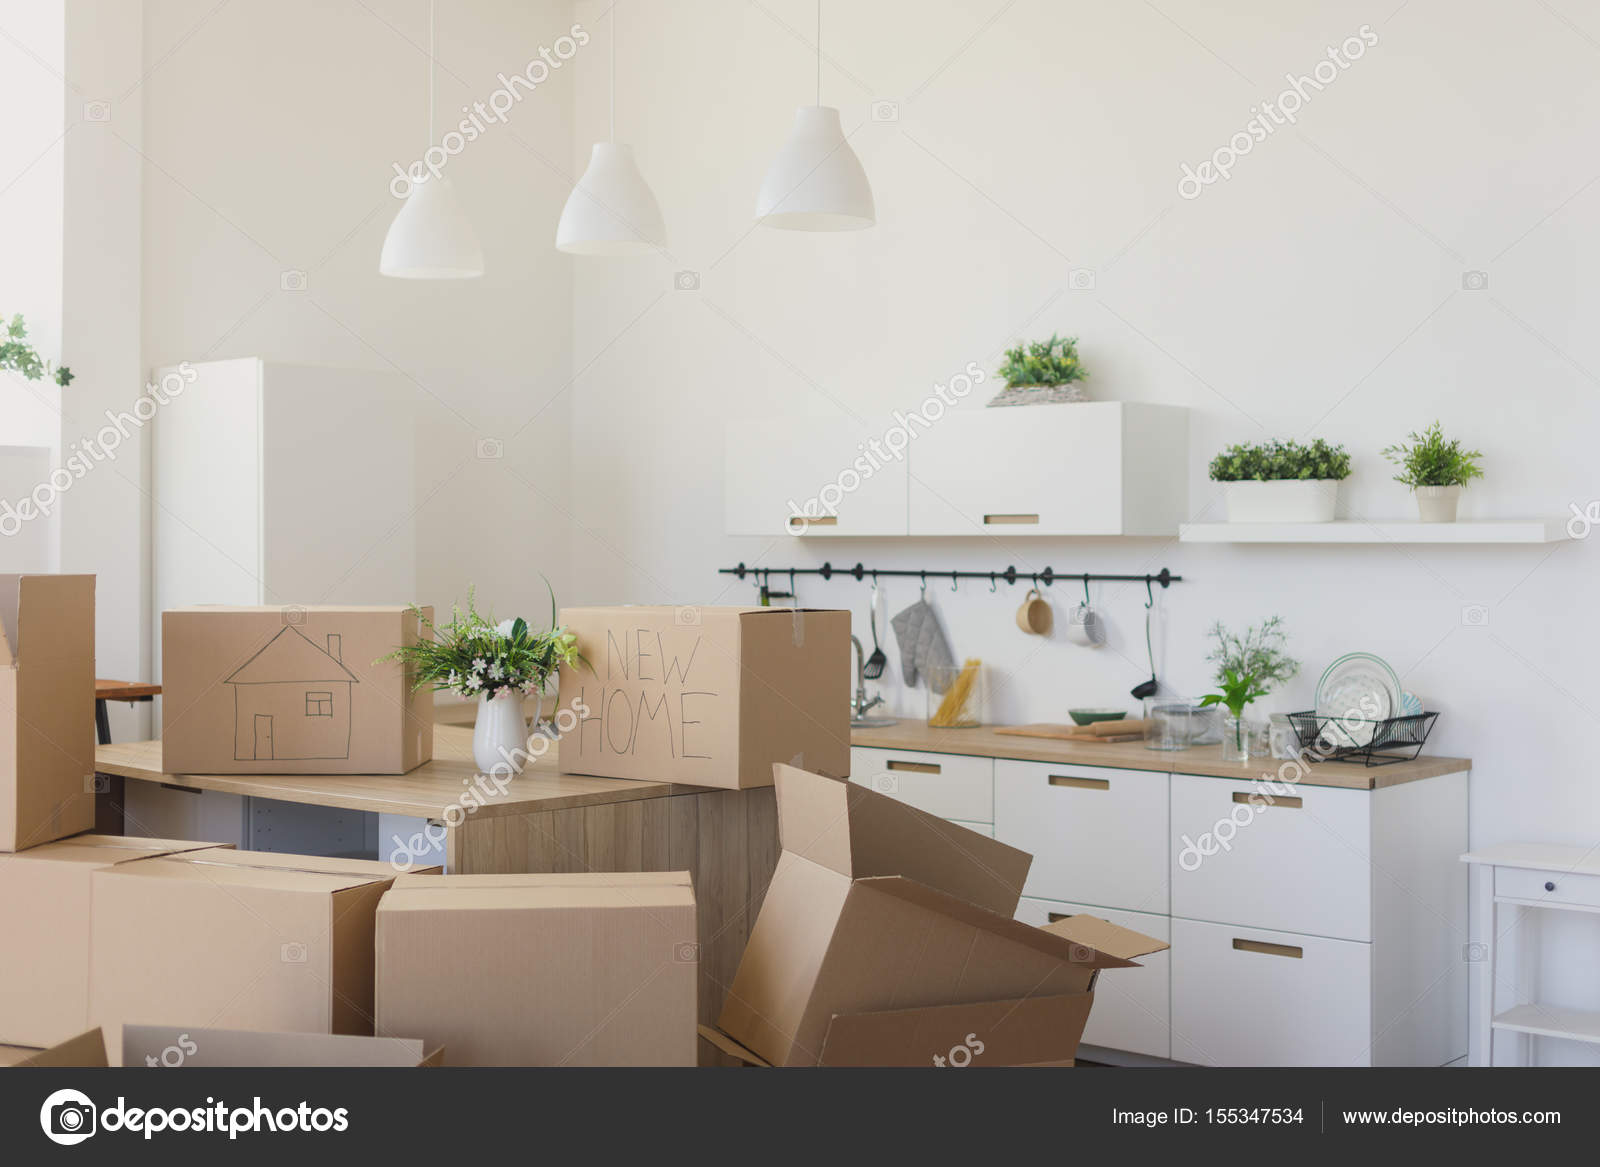 Neuen Hausbesitzer Auspacken Boxen, Boxen große Pappe in neues ...